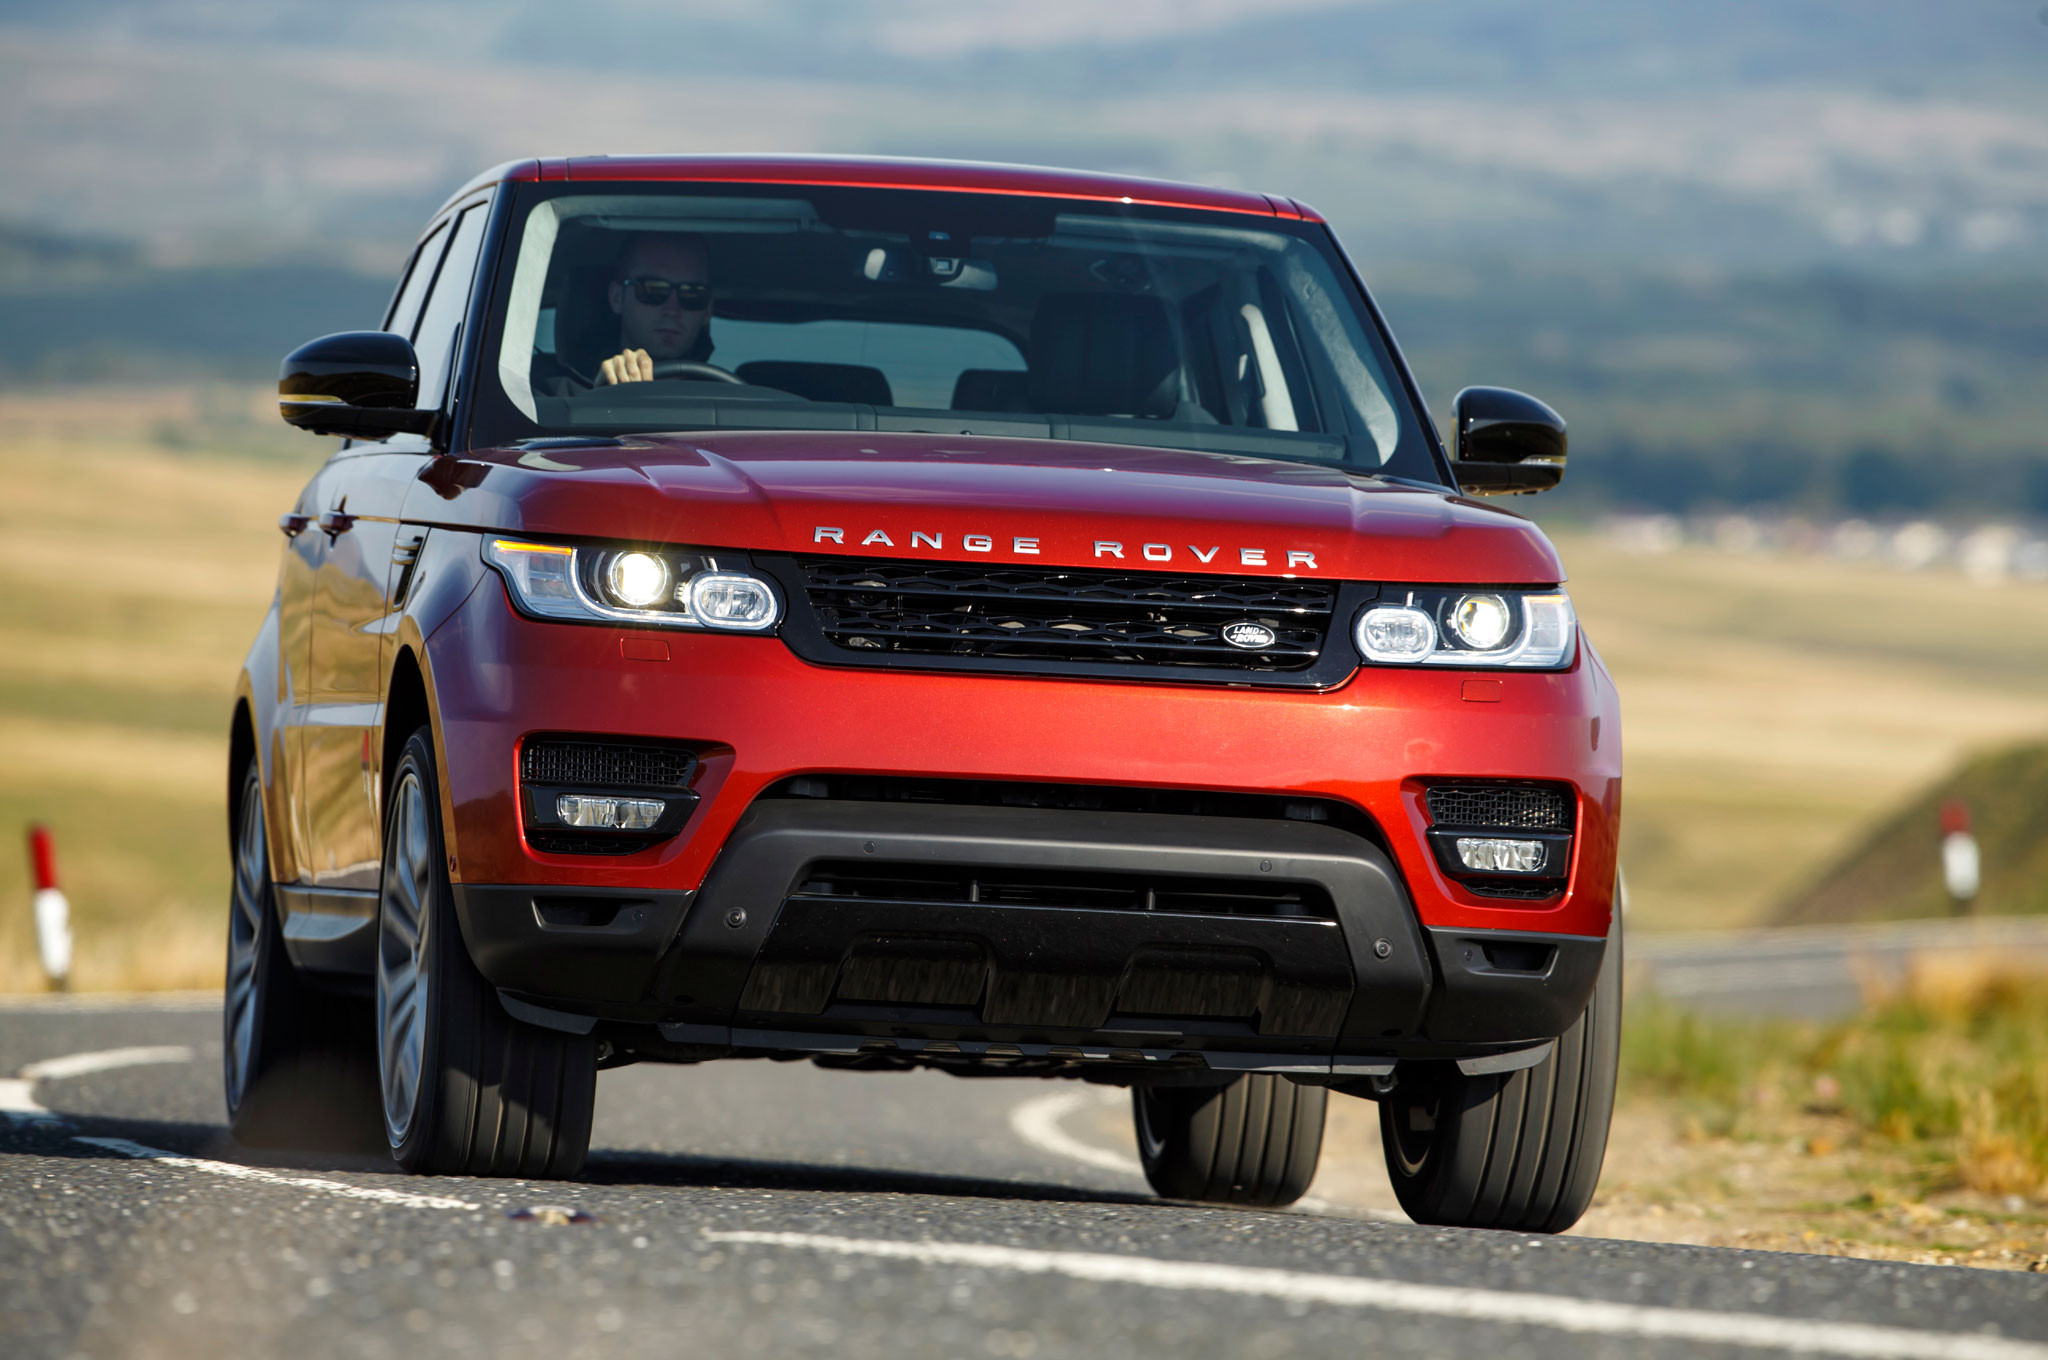 2014 Land Rover Range Rover Sport Driven